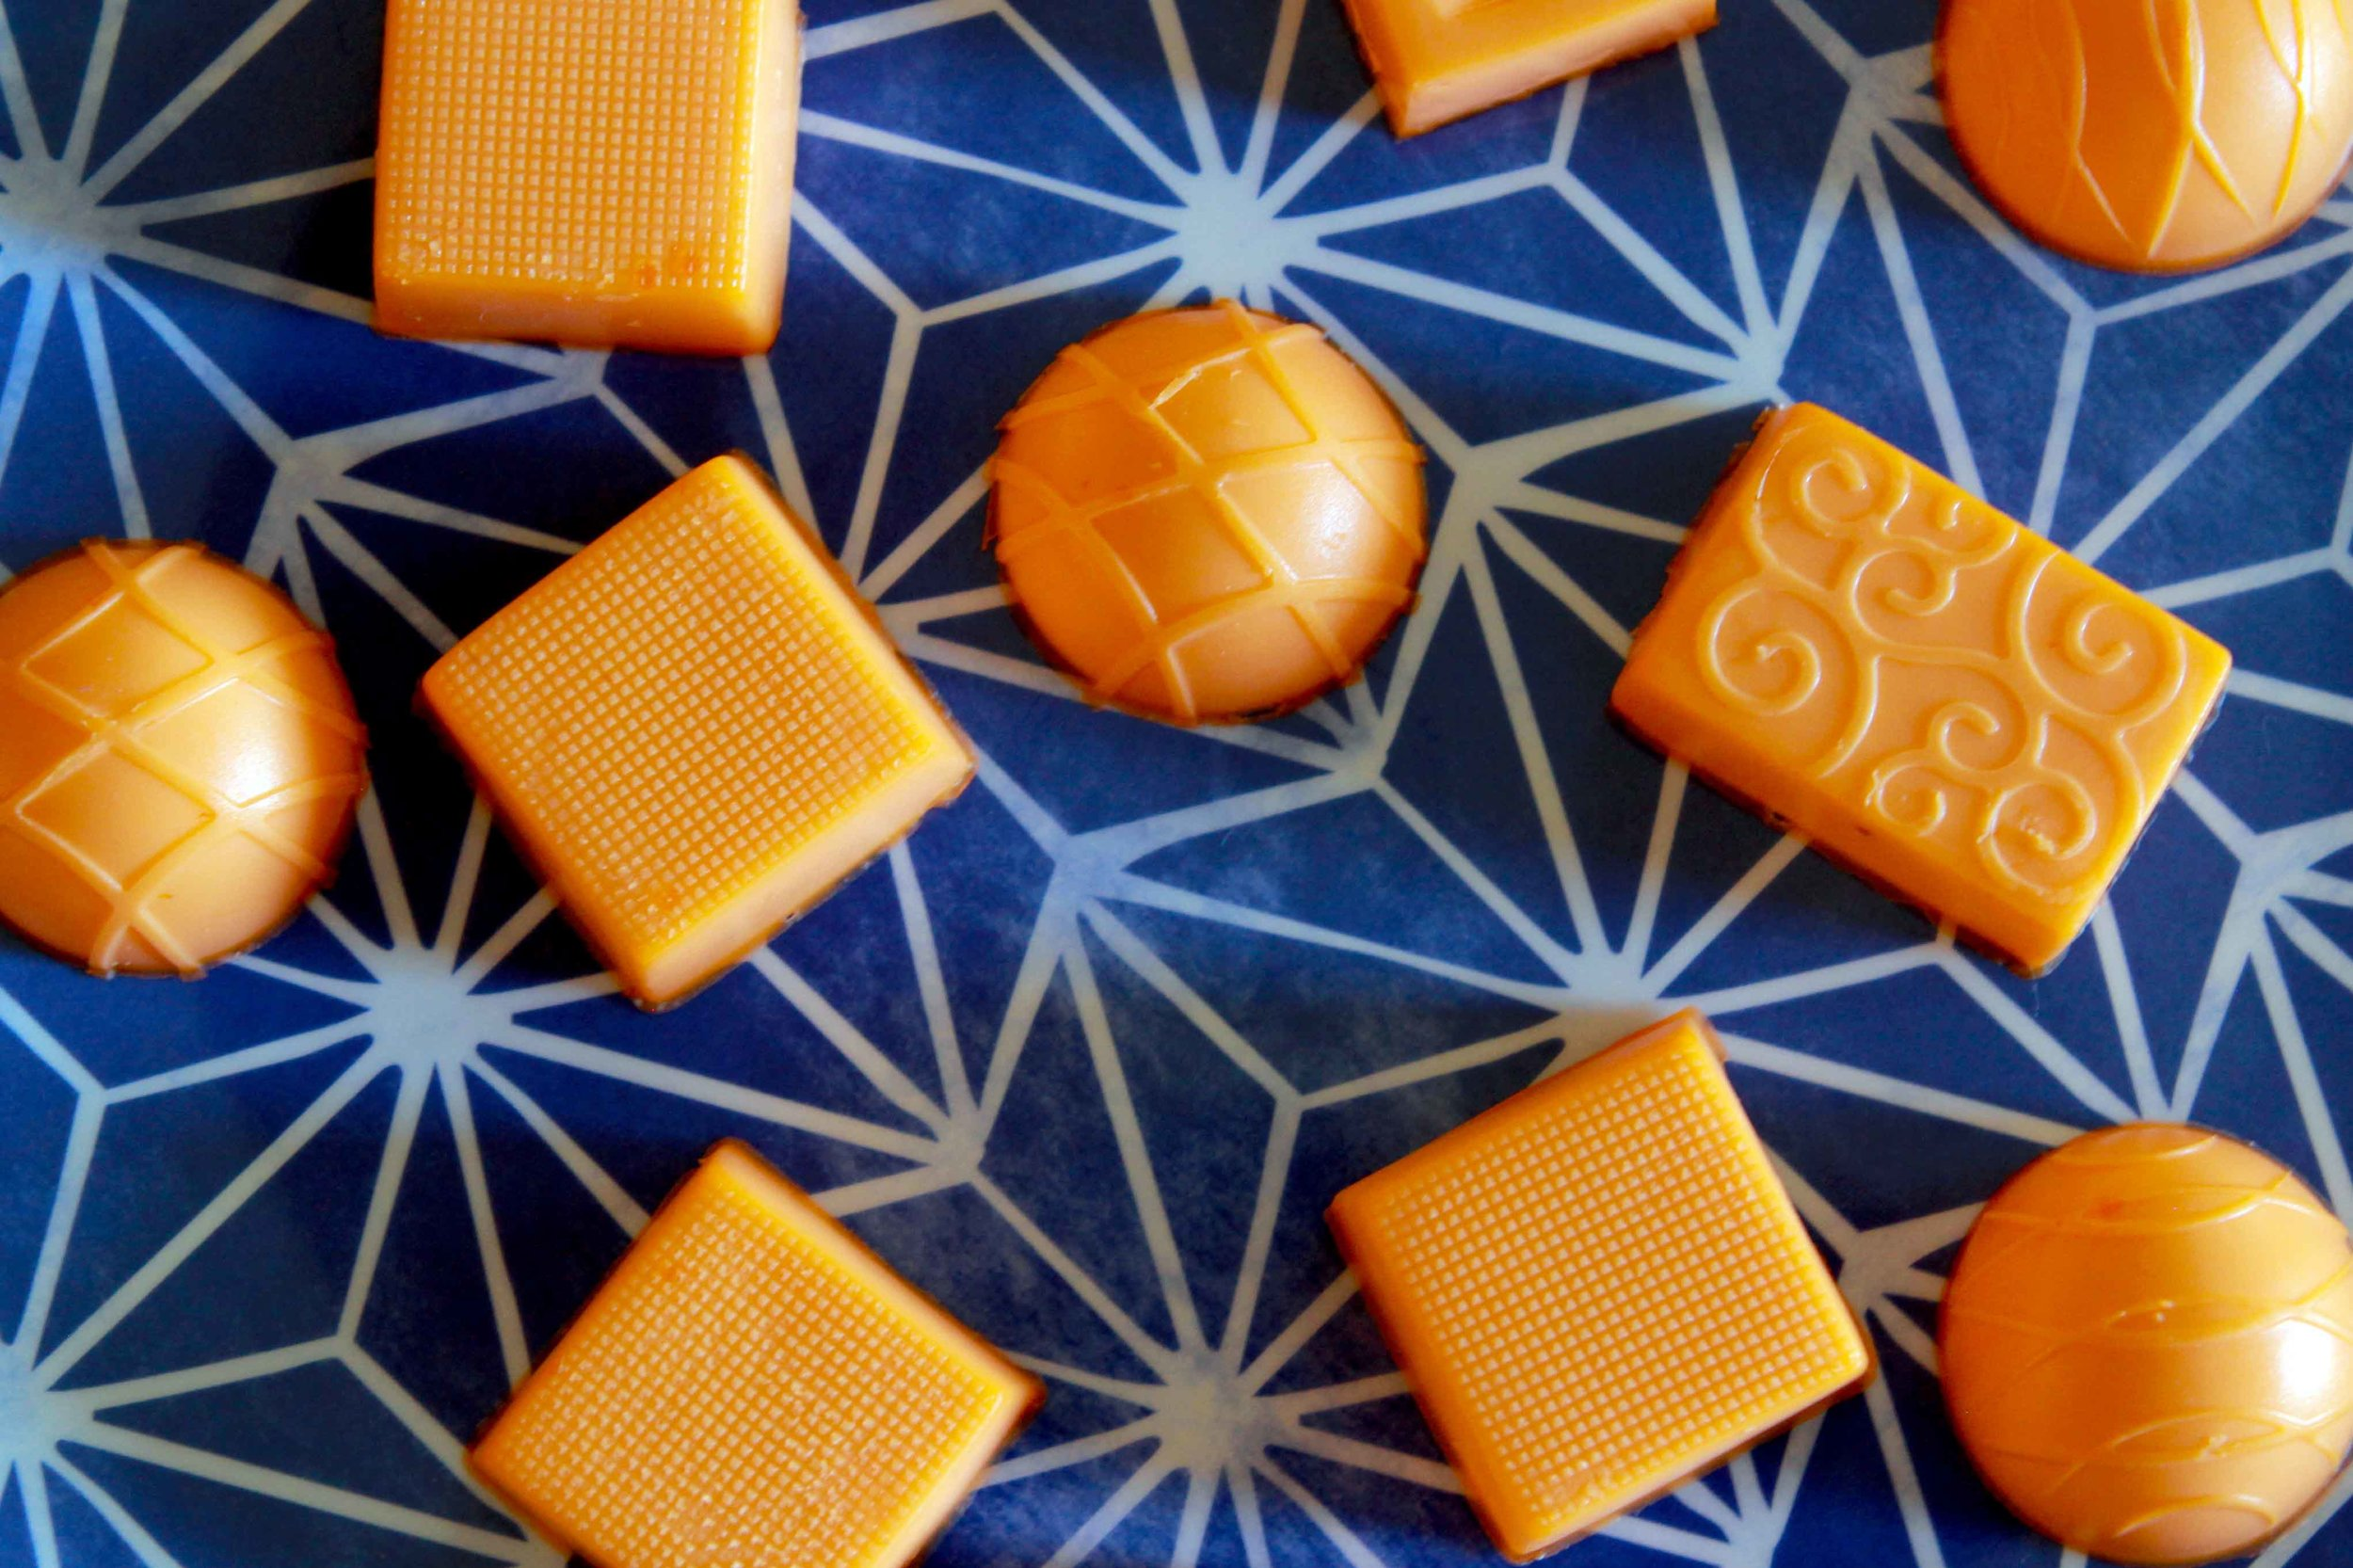 Low Carb Sugar Free Keto Orange Creamsicle Gummy Recipe